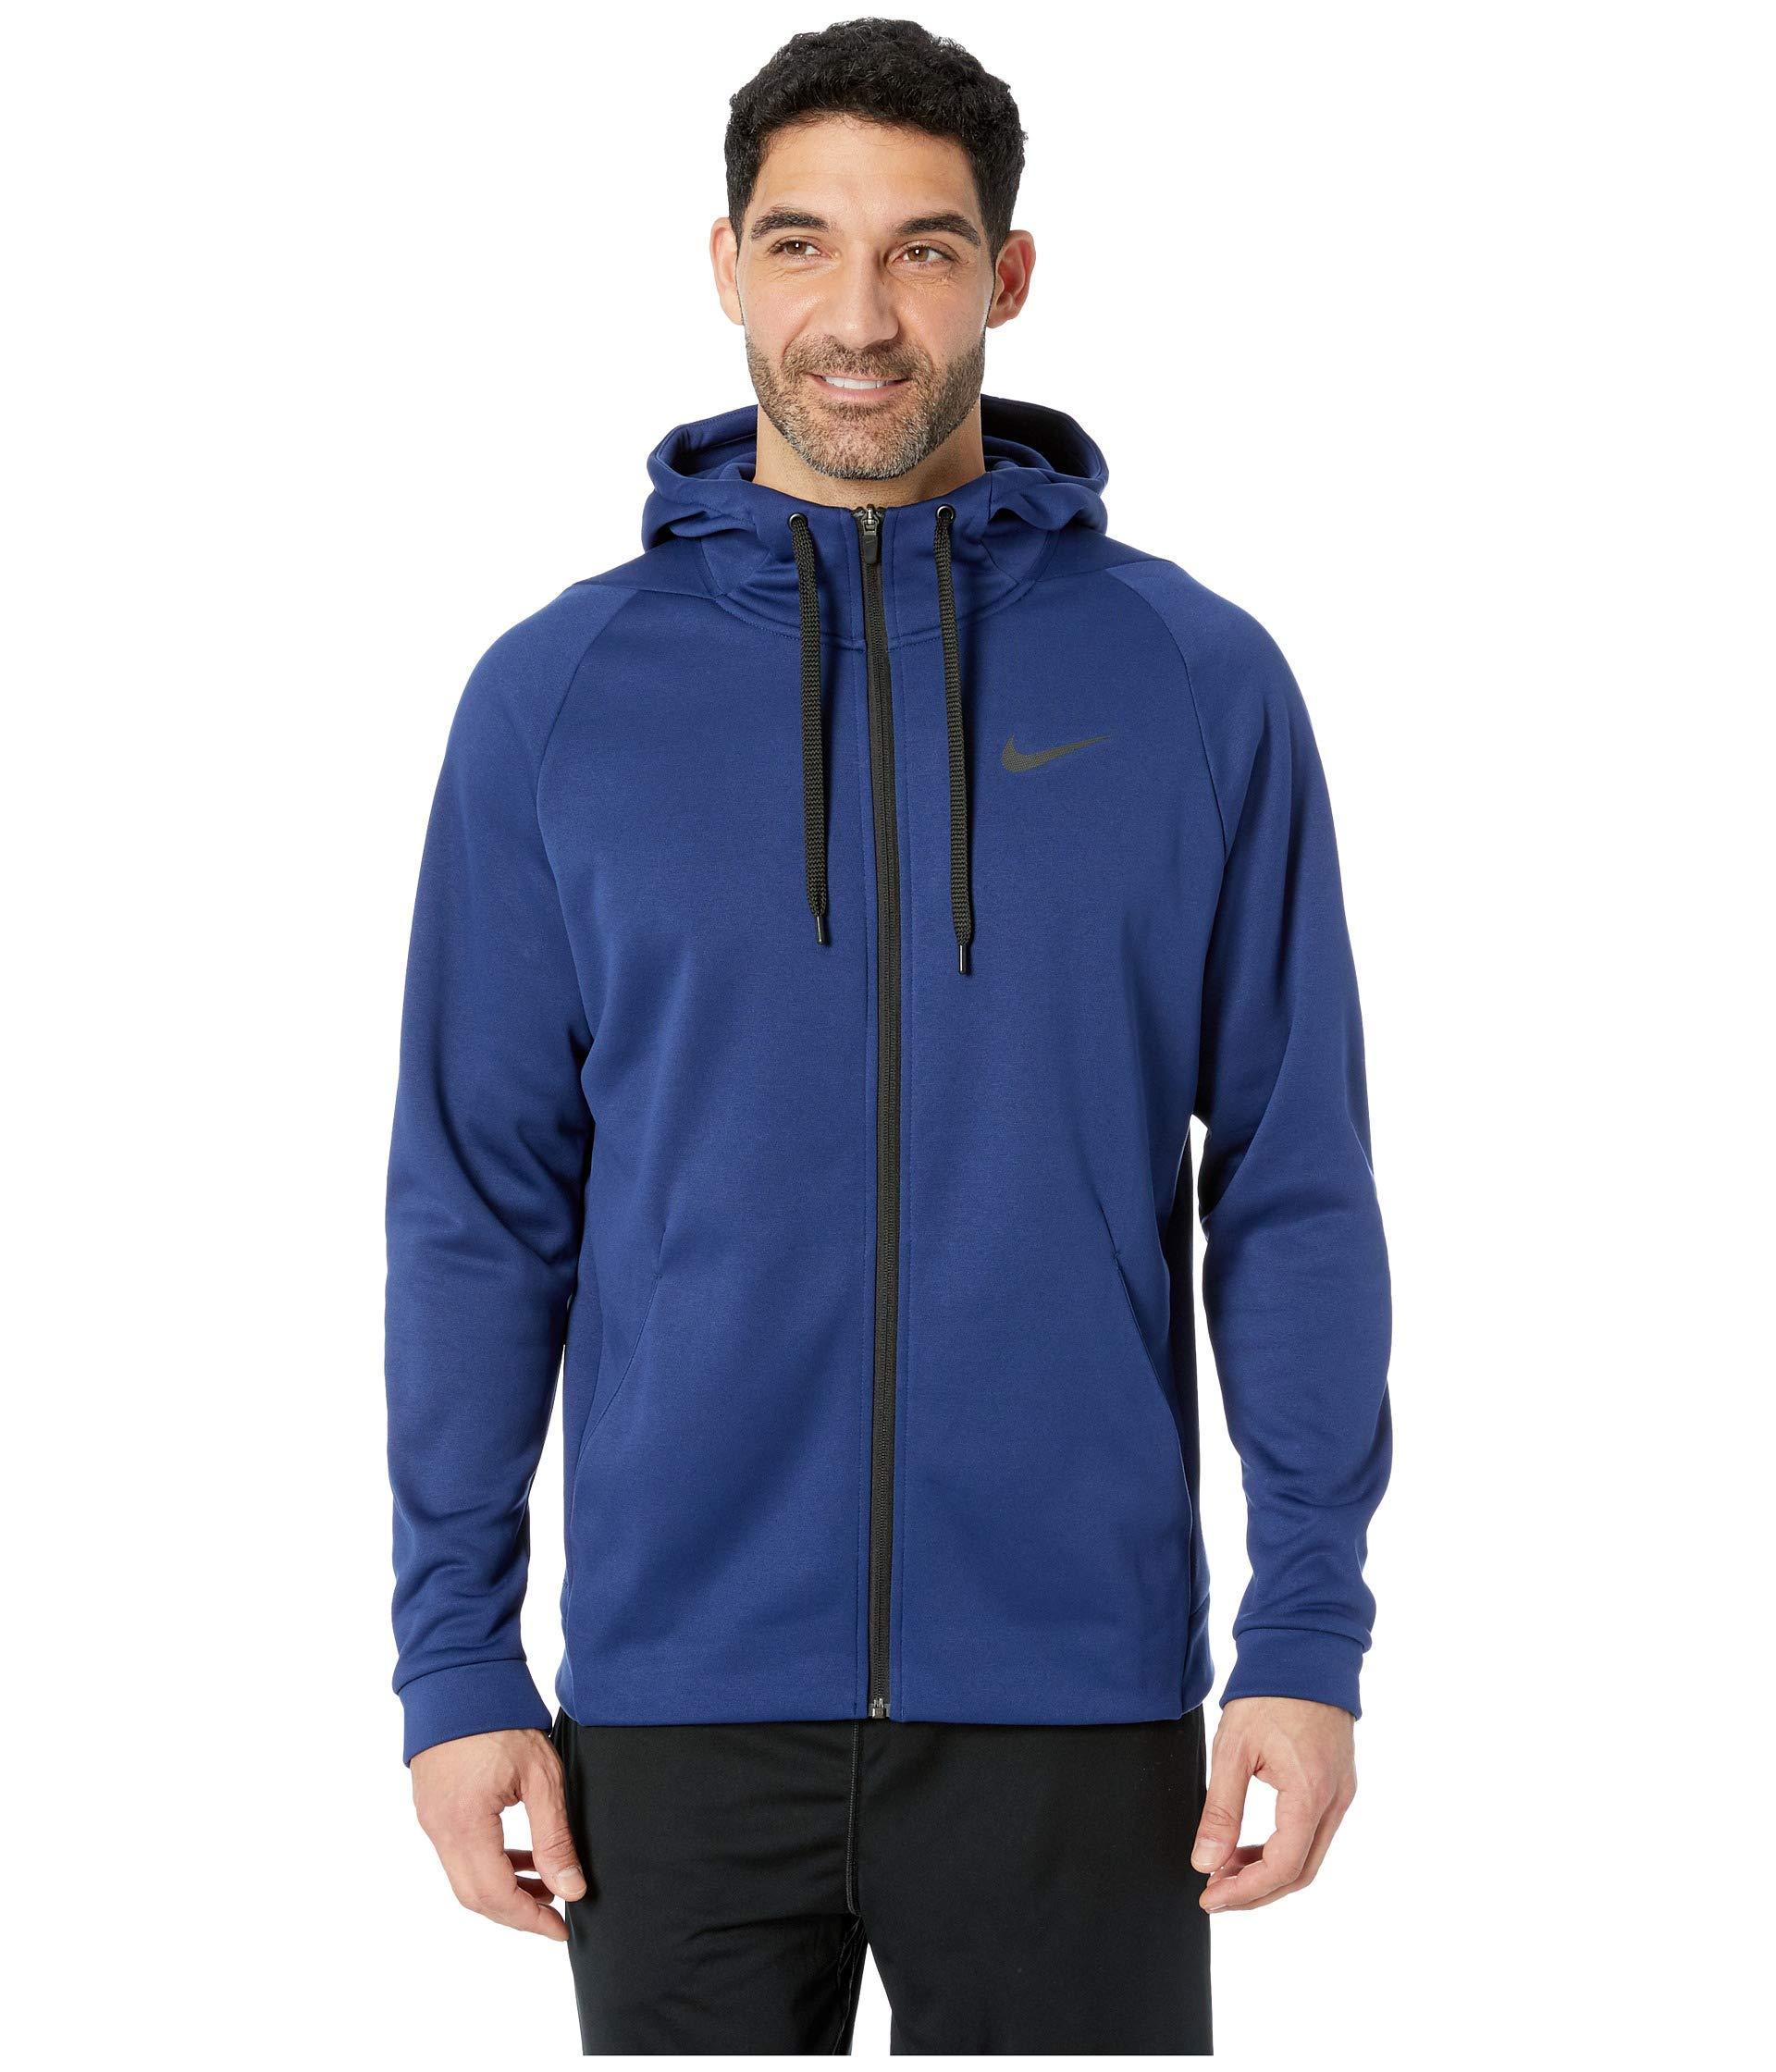 d9c6e9195788 Lyst - Nike Dri-fit Therma Men s Full-zip Training Hoodie in Blue ...